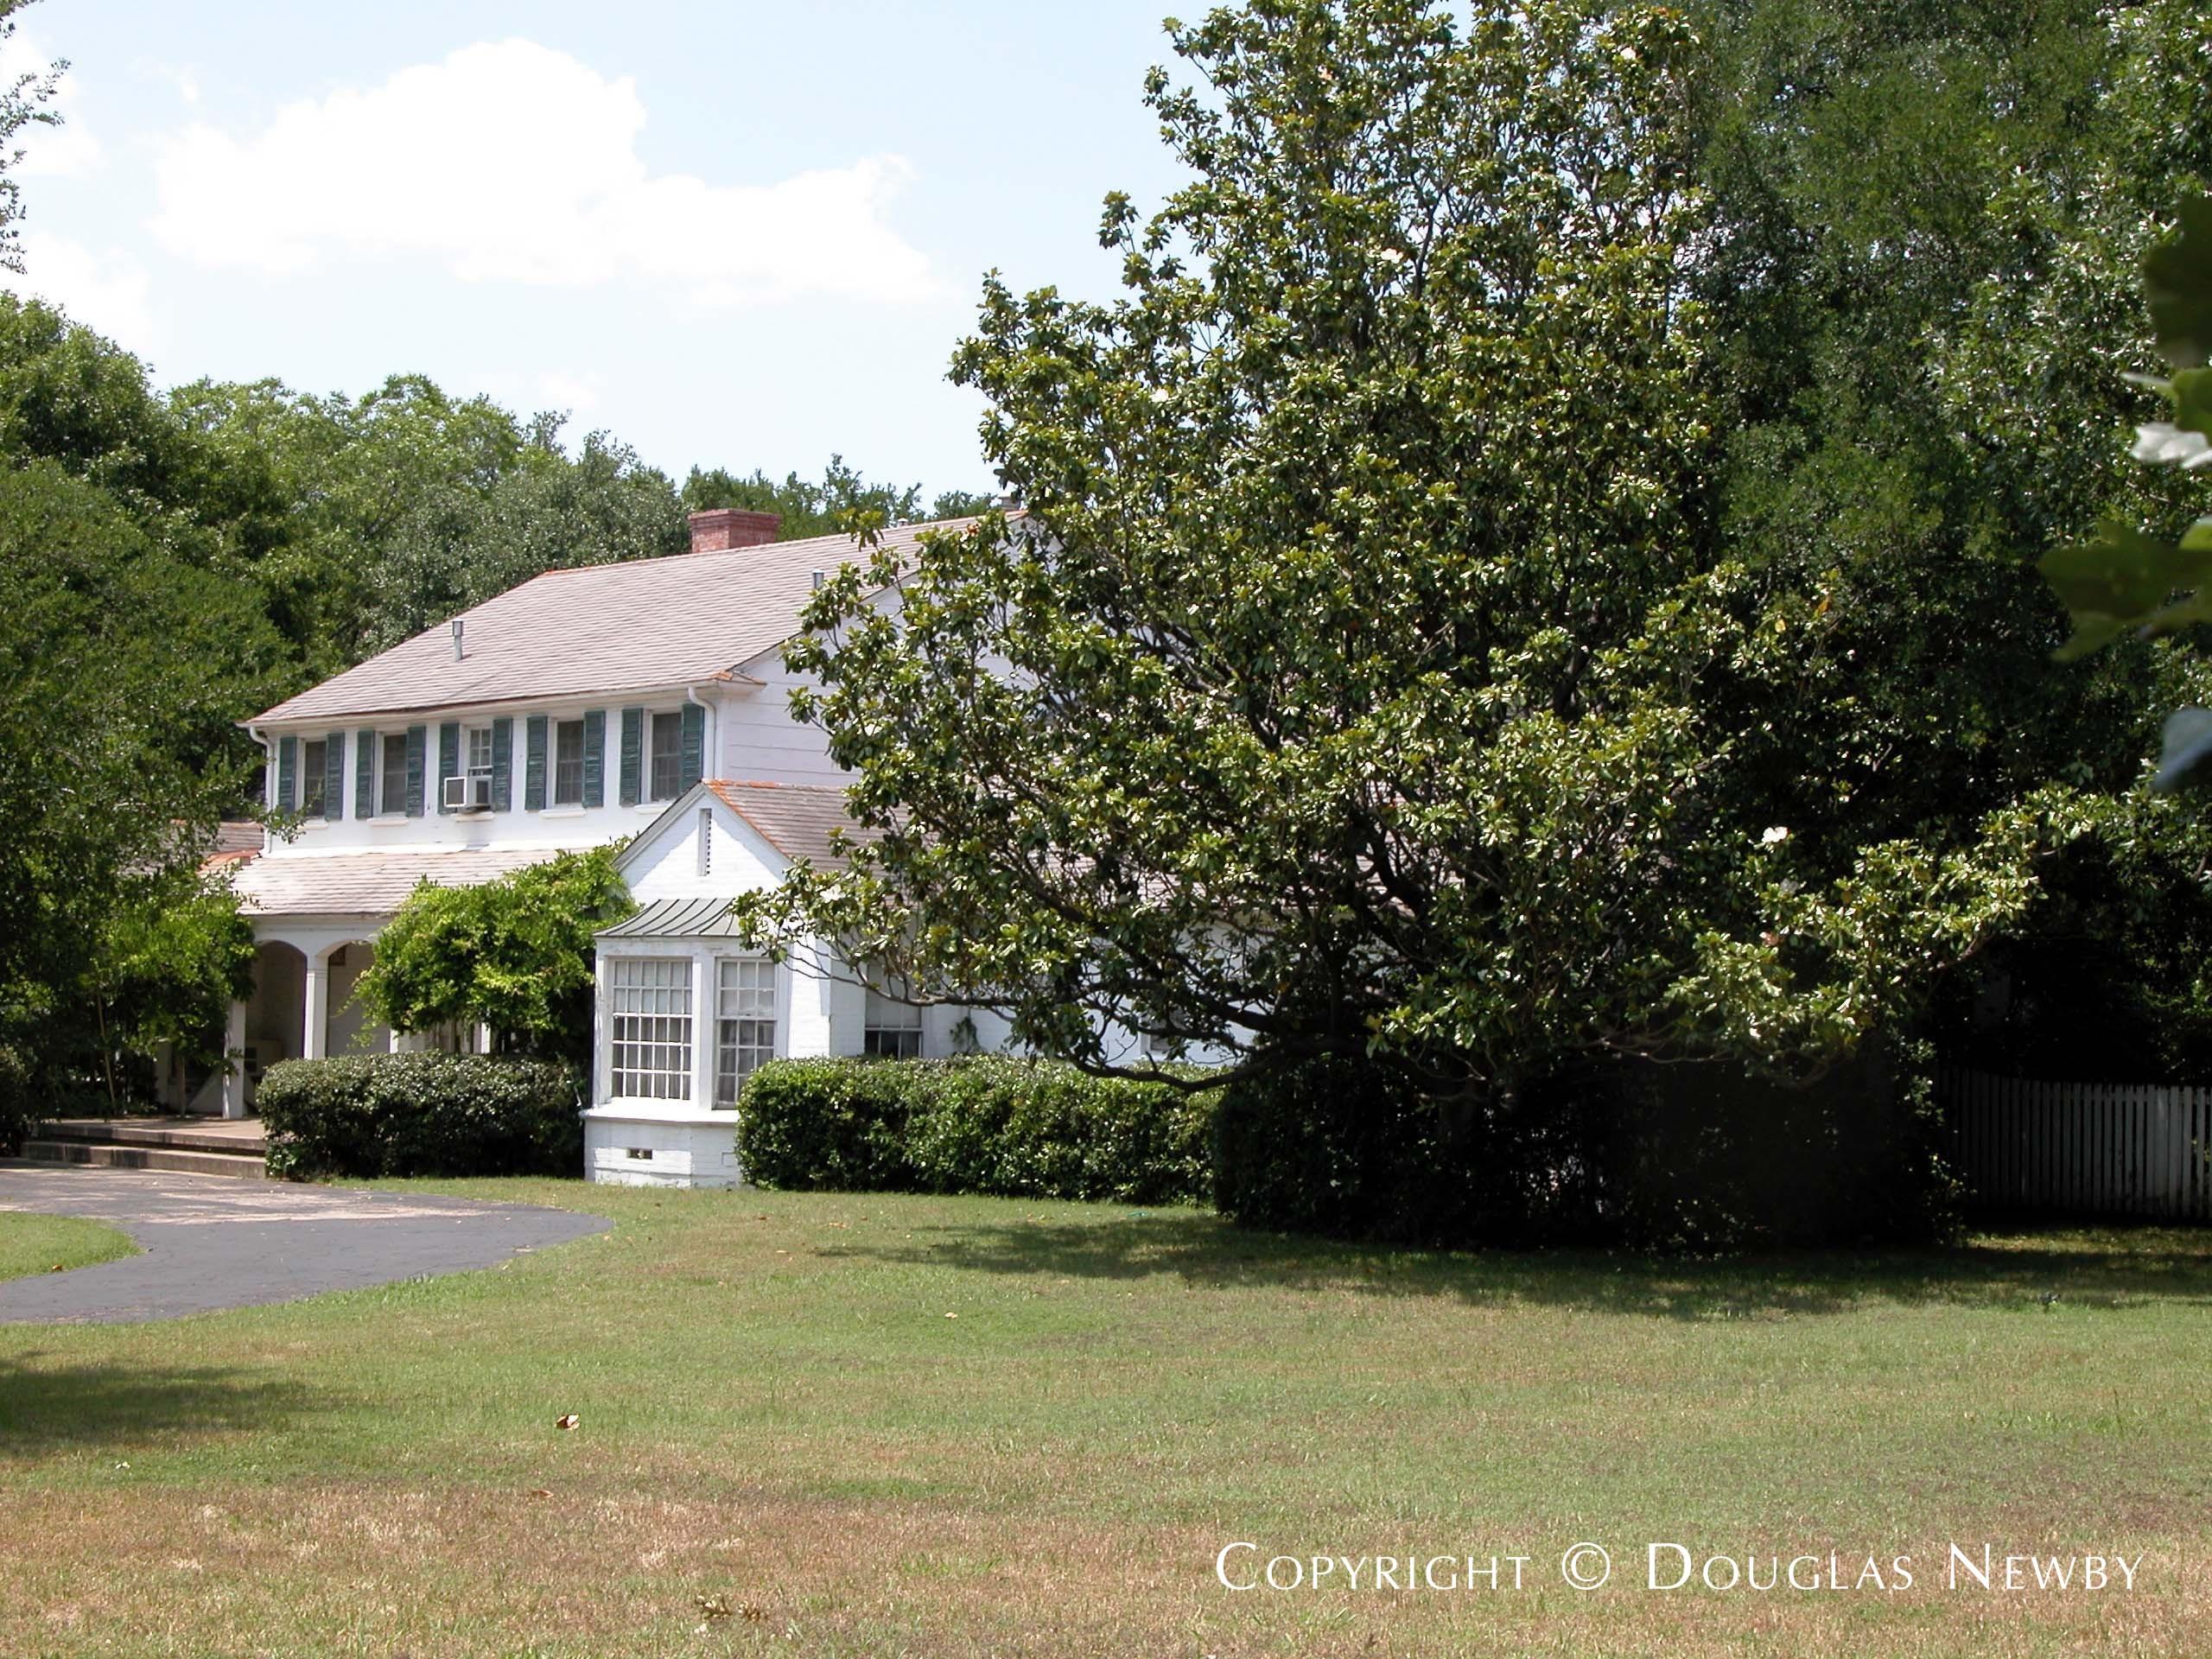 Greenway Parks Real Estate on 0.9741 Acres